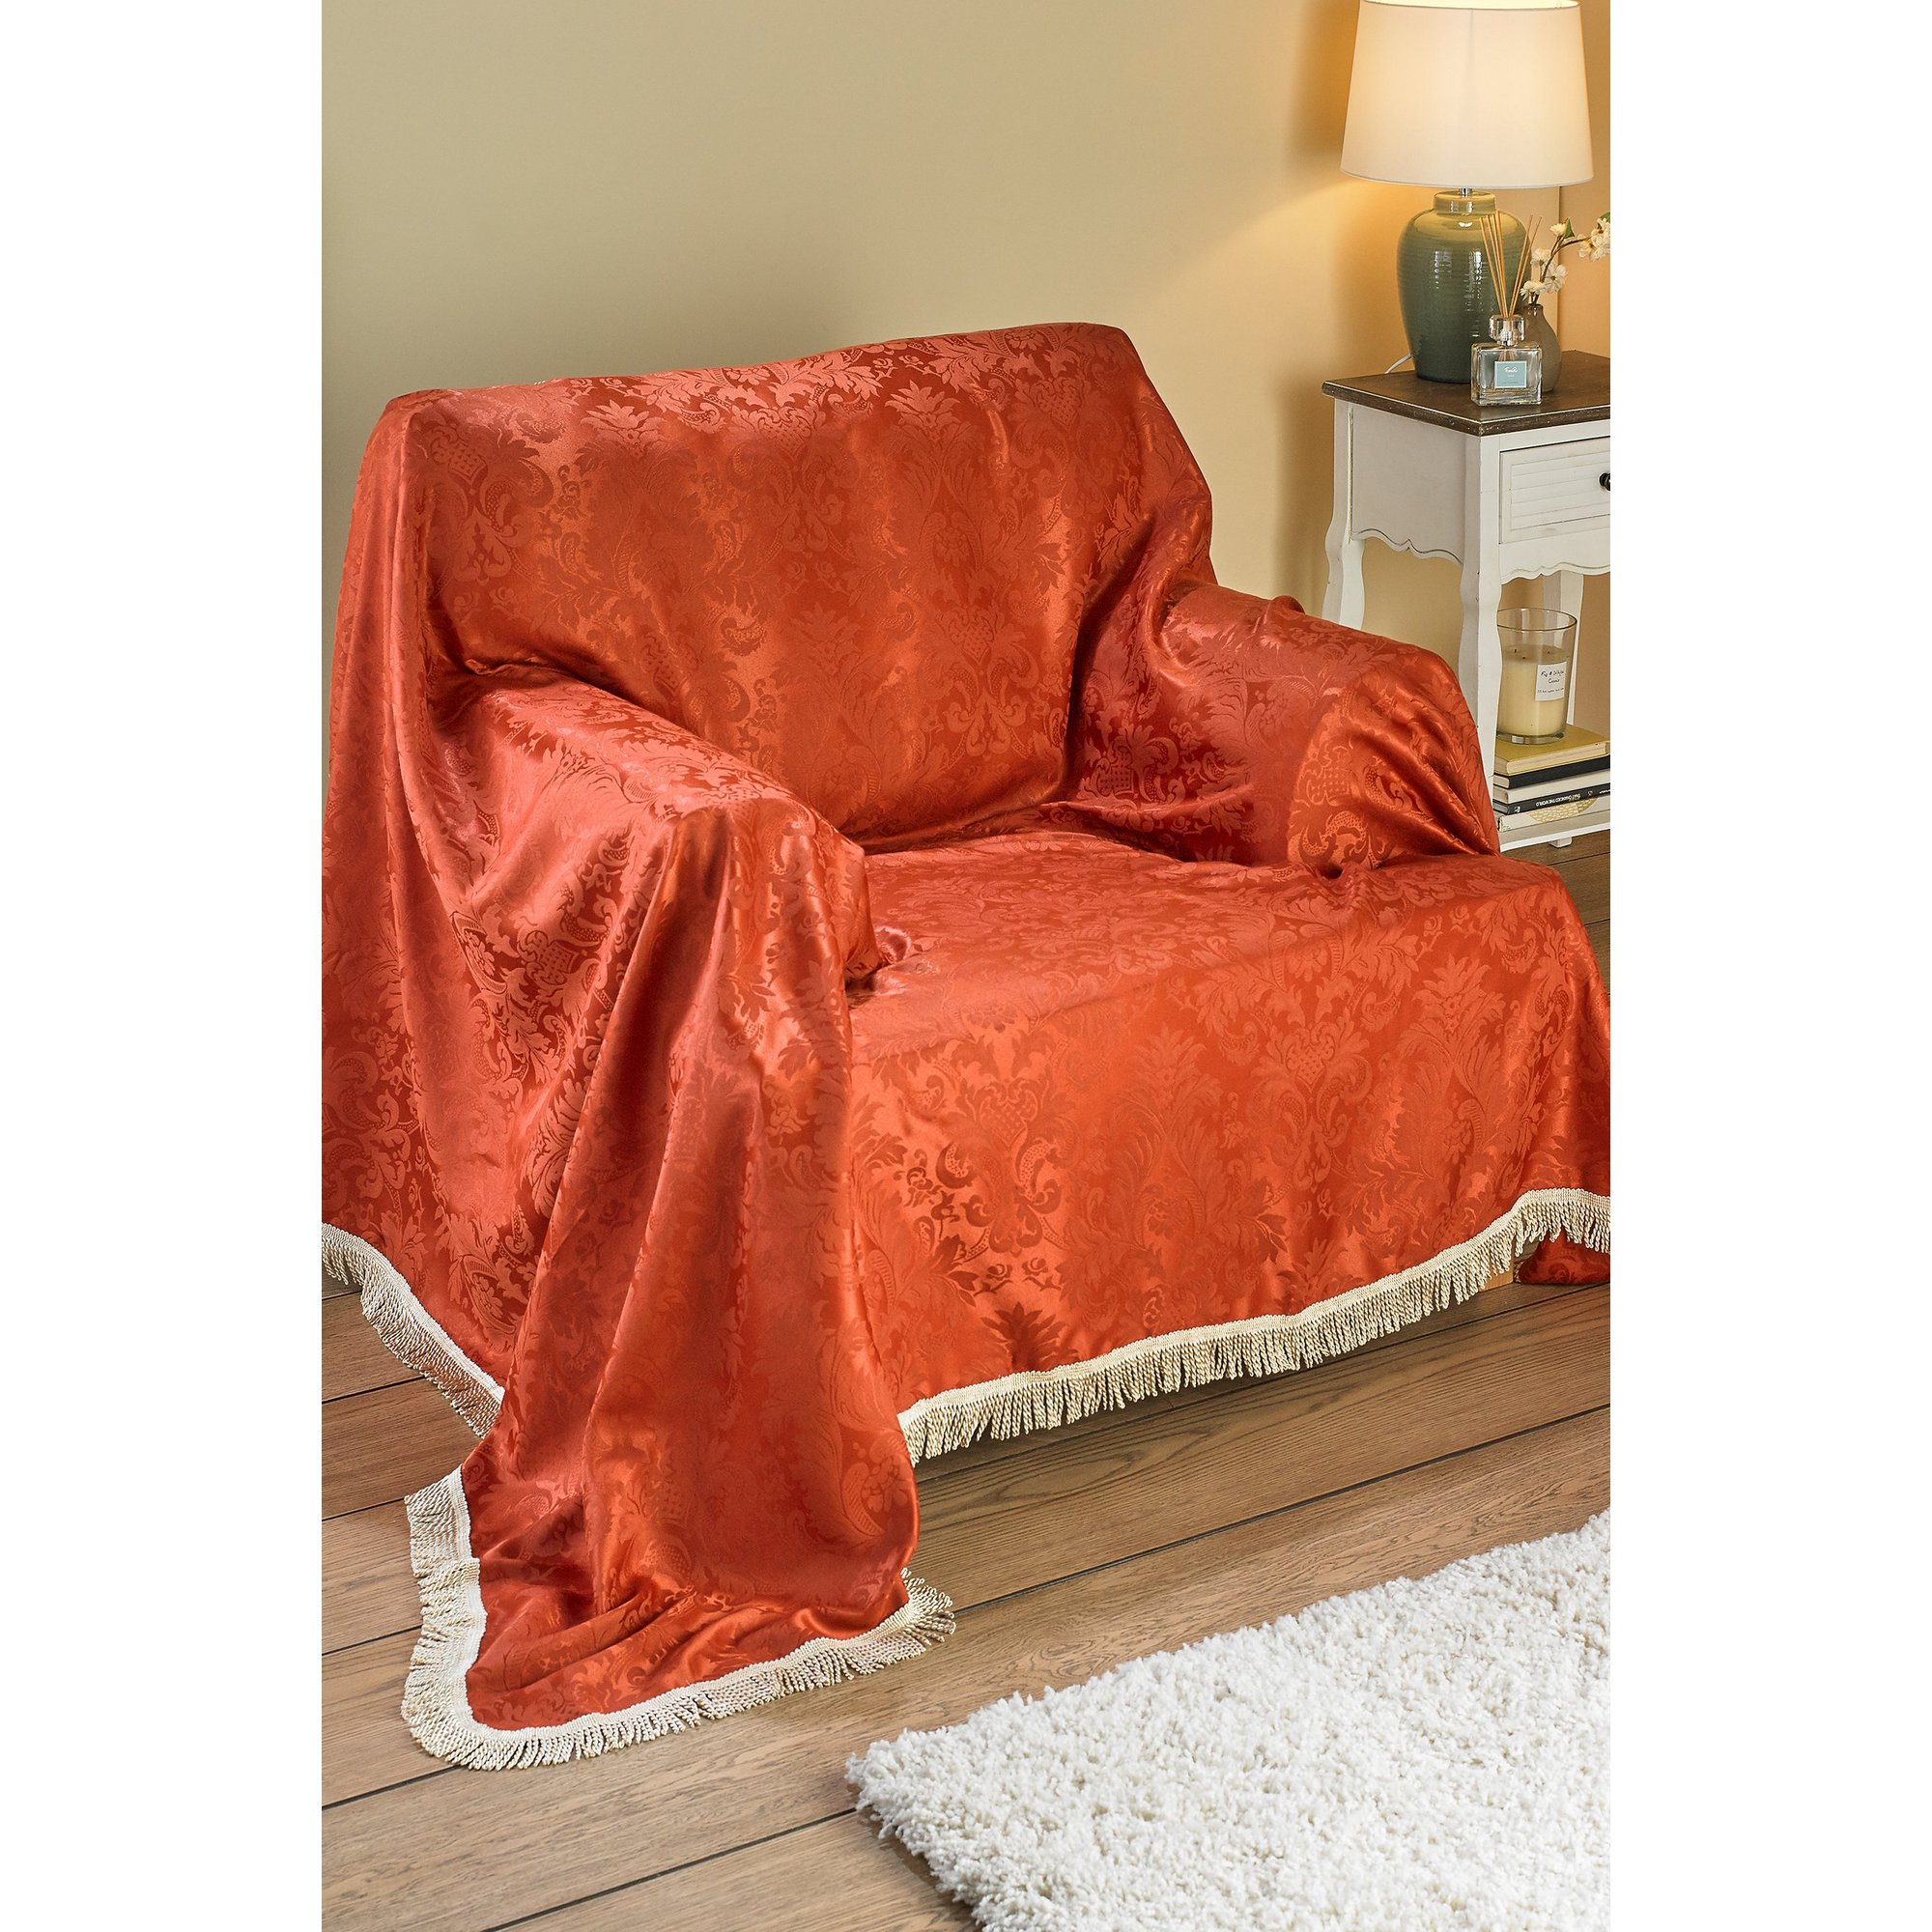 Image of Ascot Damask Fringed Sofa Cover